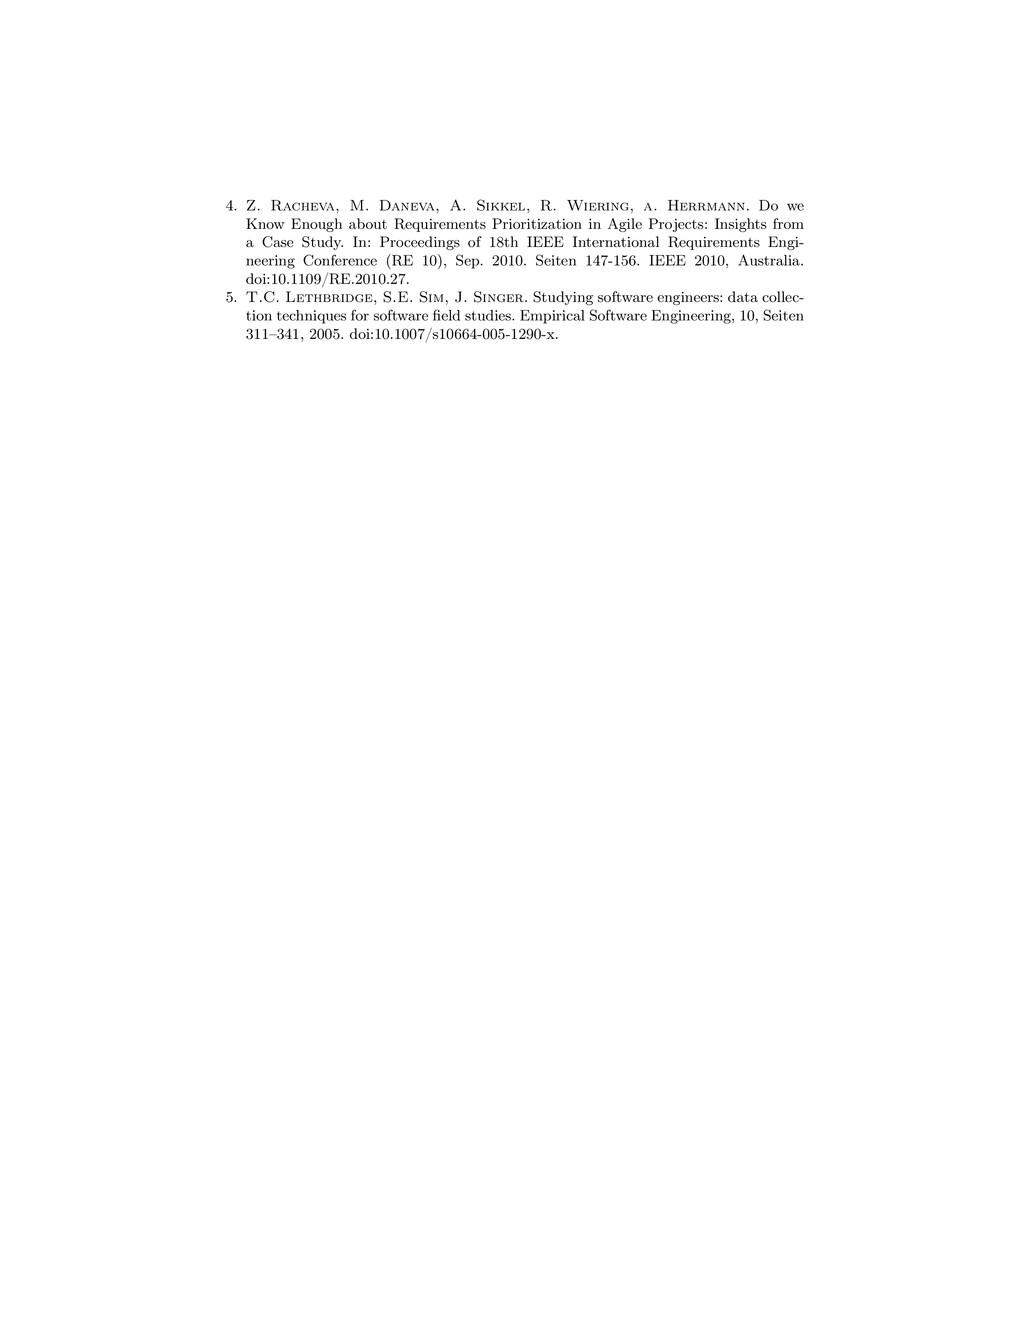 4. Z. Racheva, M. Daneva, A. Sikkel, R. Wiering...